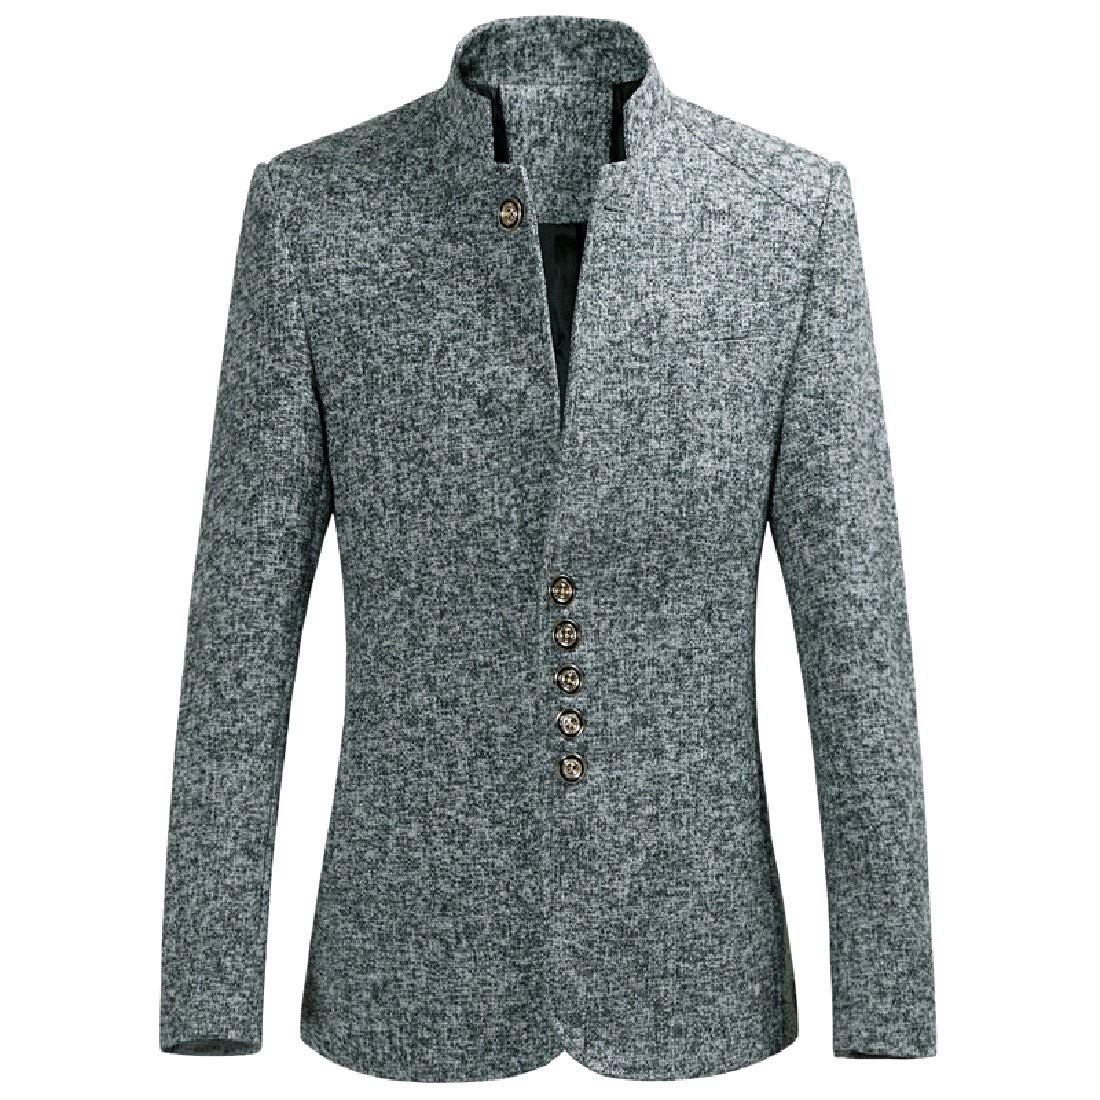 a668f280b88 Grey Zimase Men MidLong Stand Collar Oversize Button Button Button Blazer  Jacket Suits 774e04